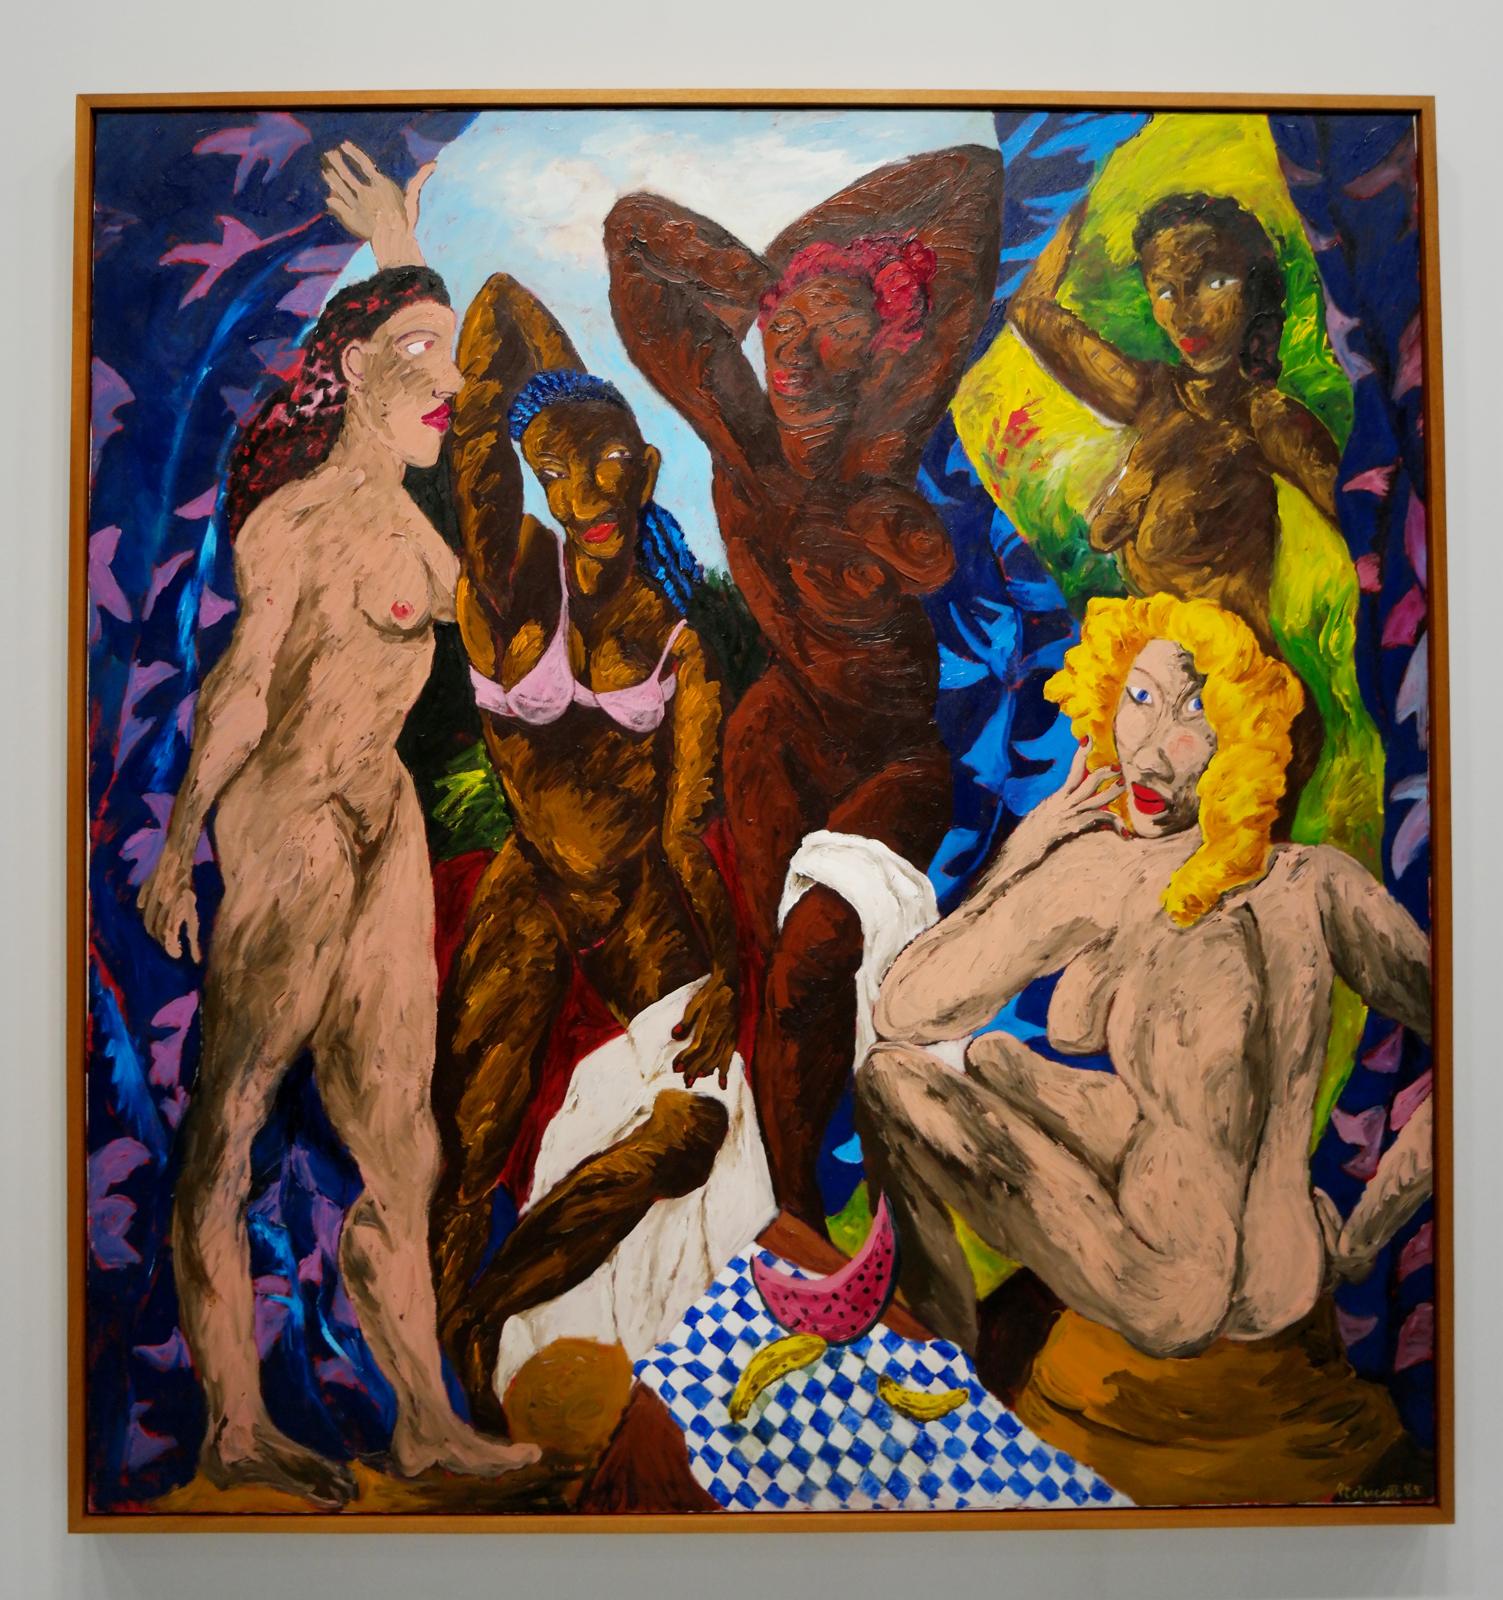 Les Demoiselles d'Alabama dénudées, 1985, Robert Colescott